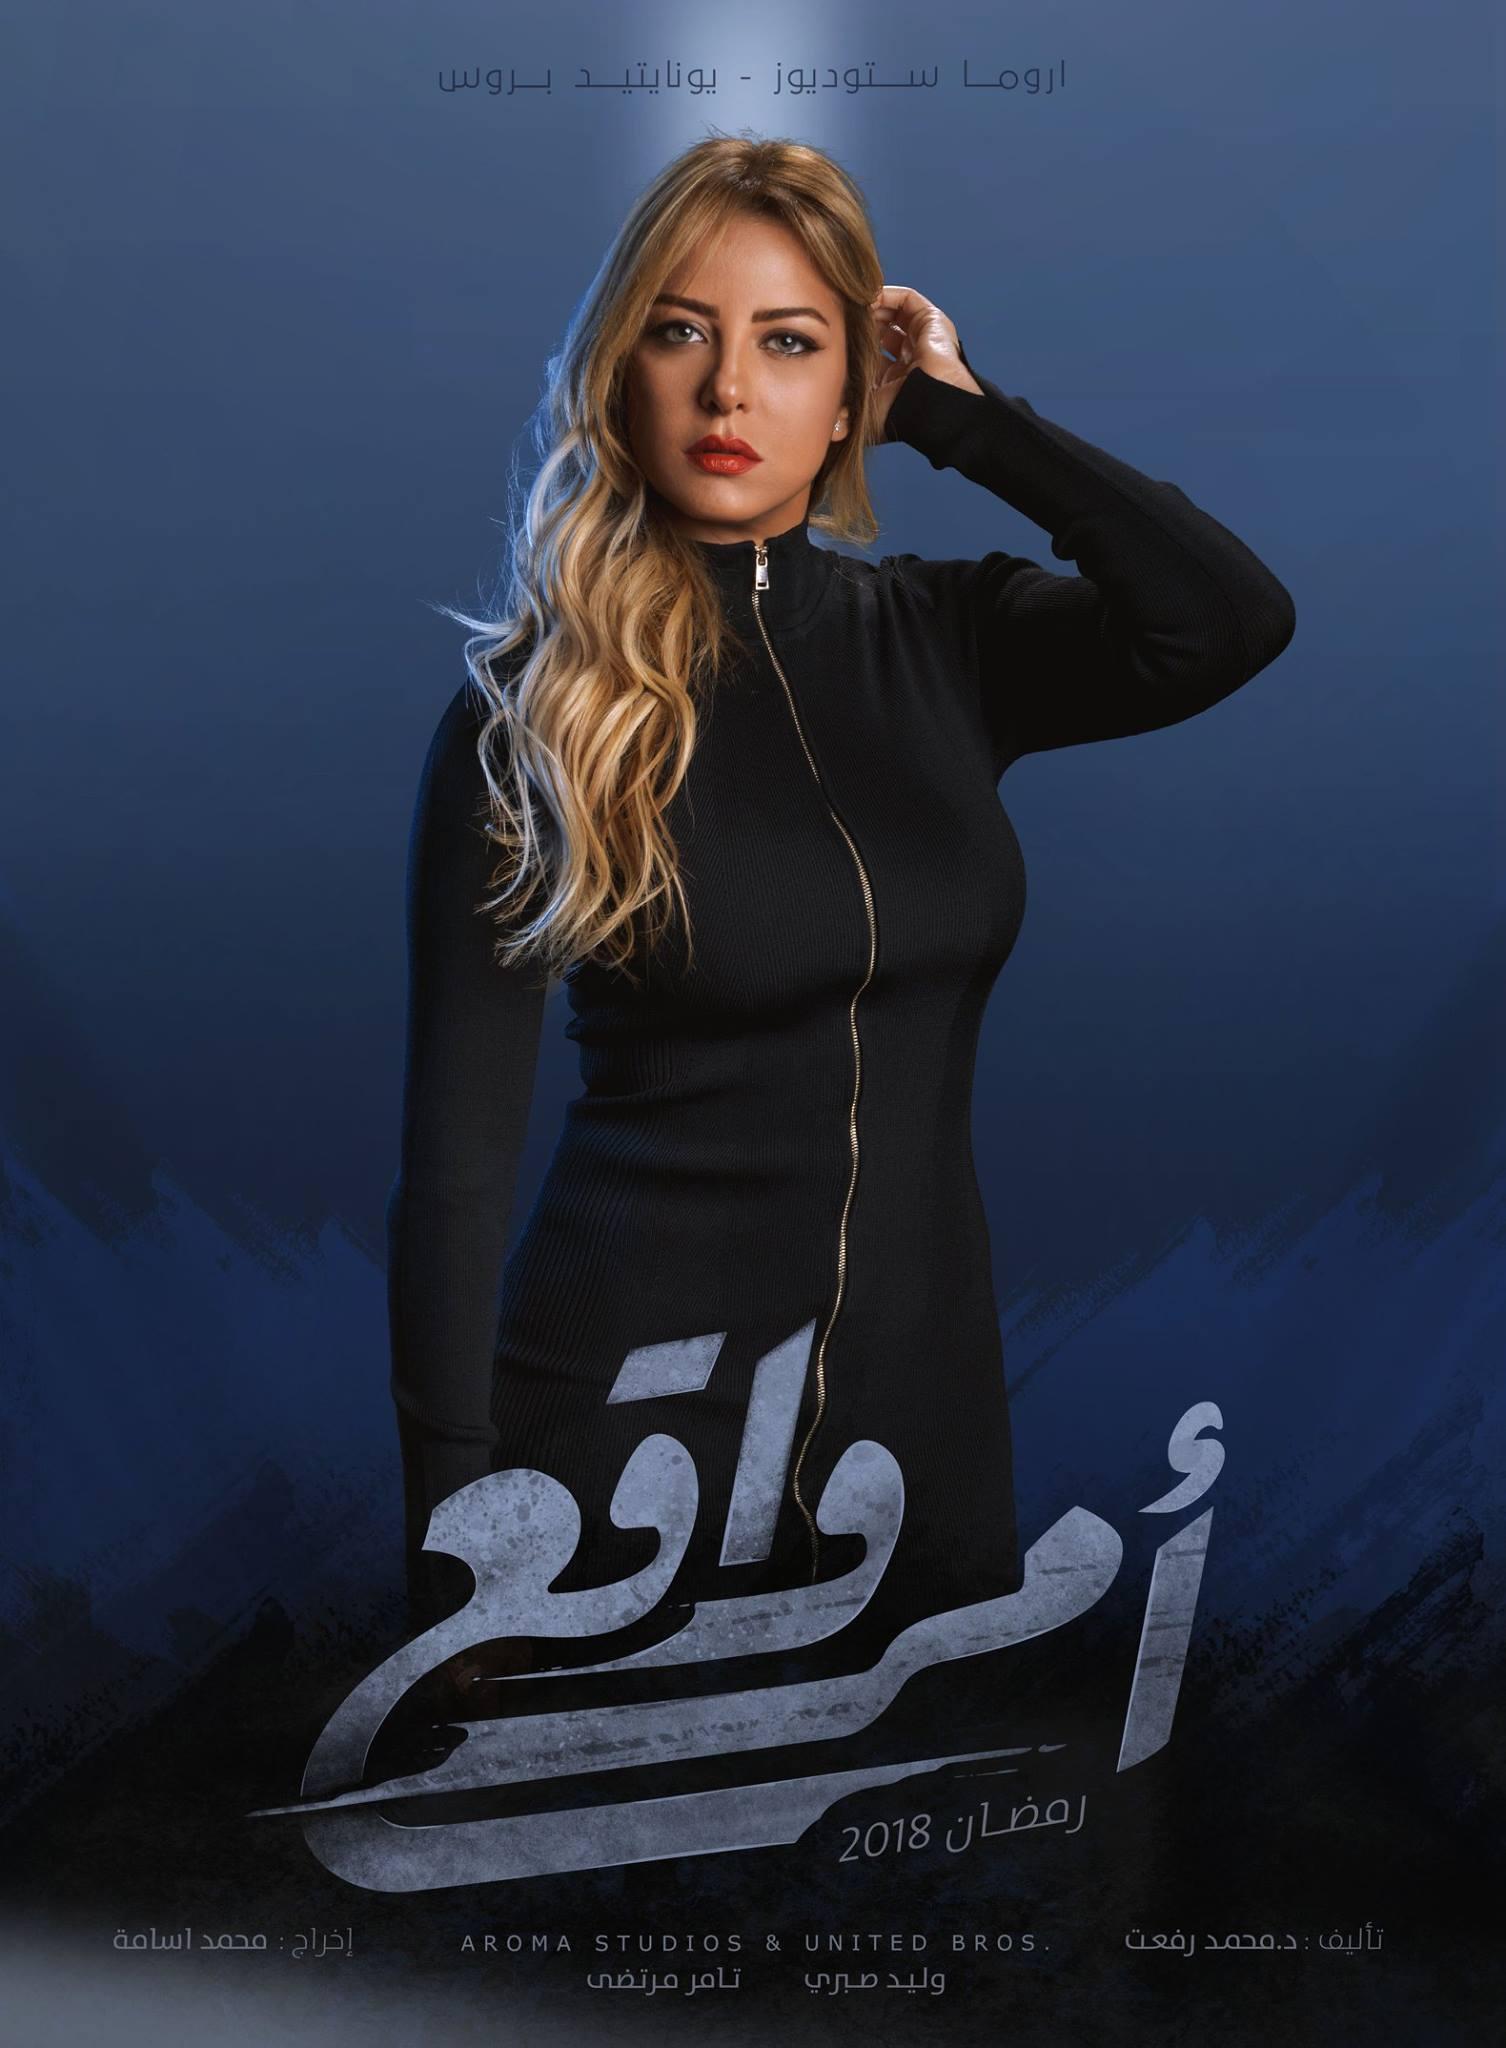 ريم مصطفى